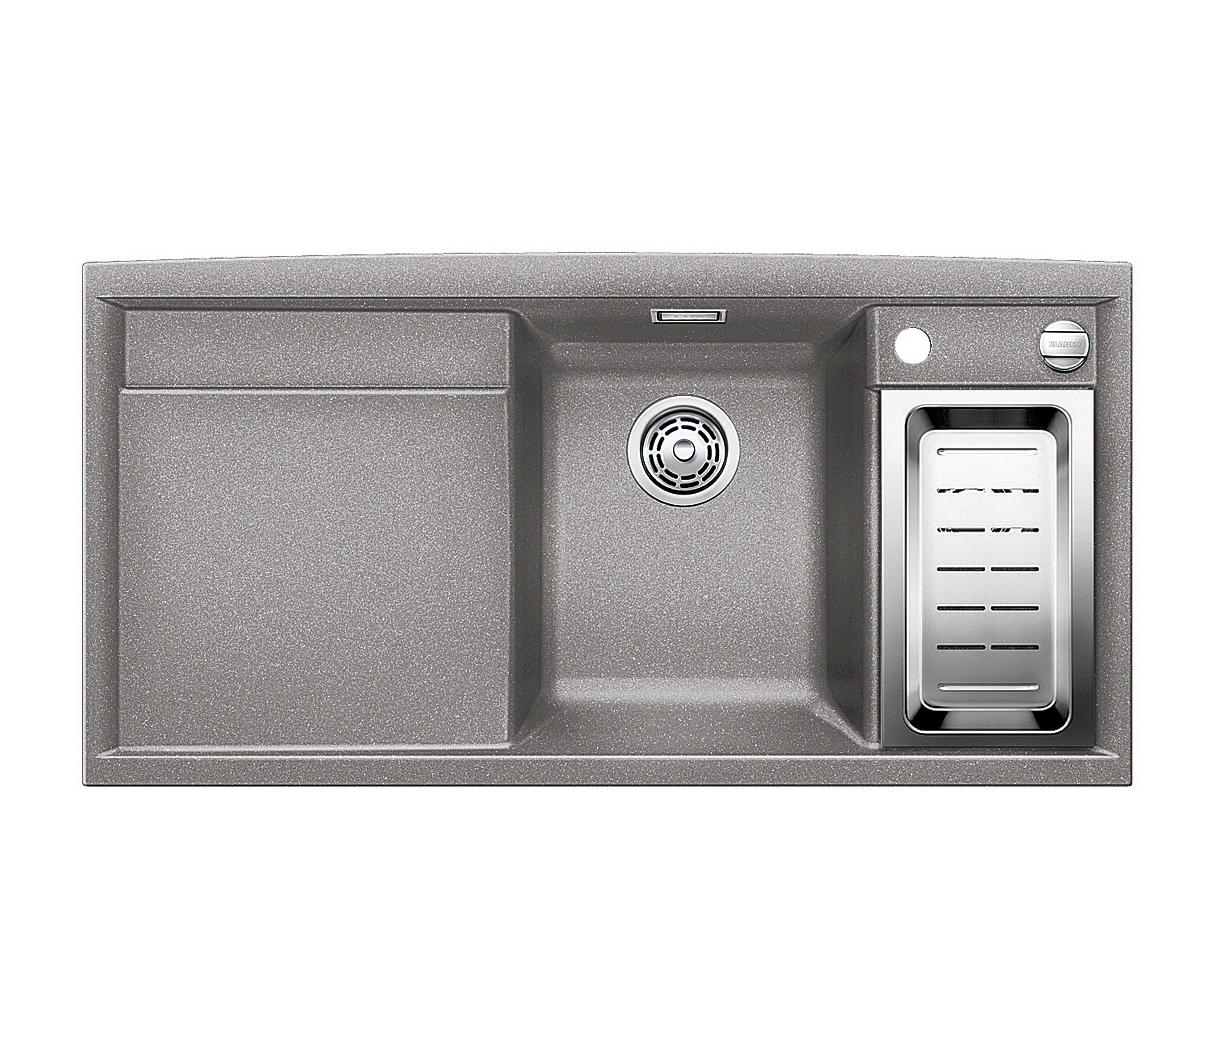 blanco axia ii 6 s silgranit alu metallic kitchen. Black Bedroom Furniture Sets. Home Design Ideas